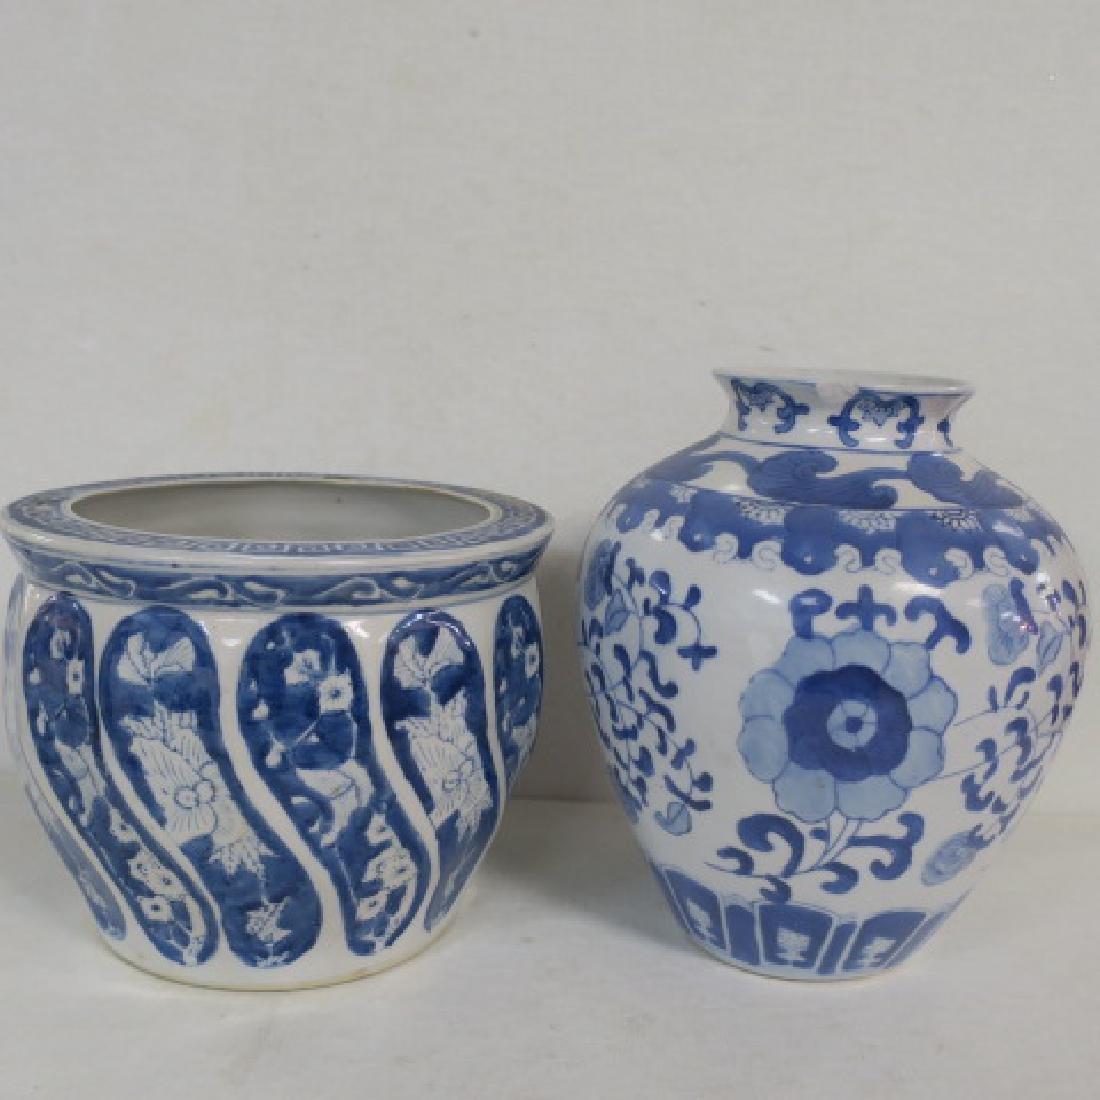 Blue and White Ceramic Jar, Planter and Vase: - 3